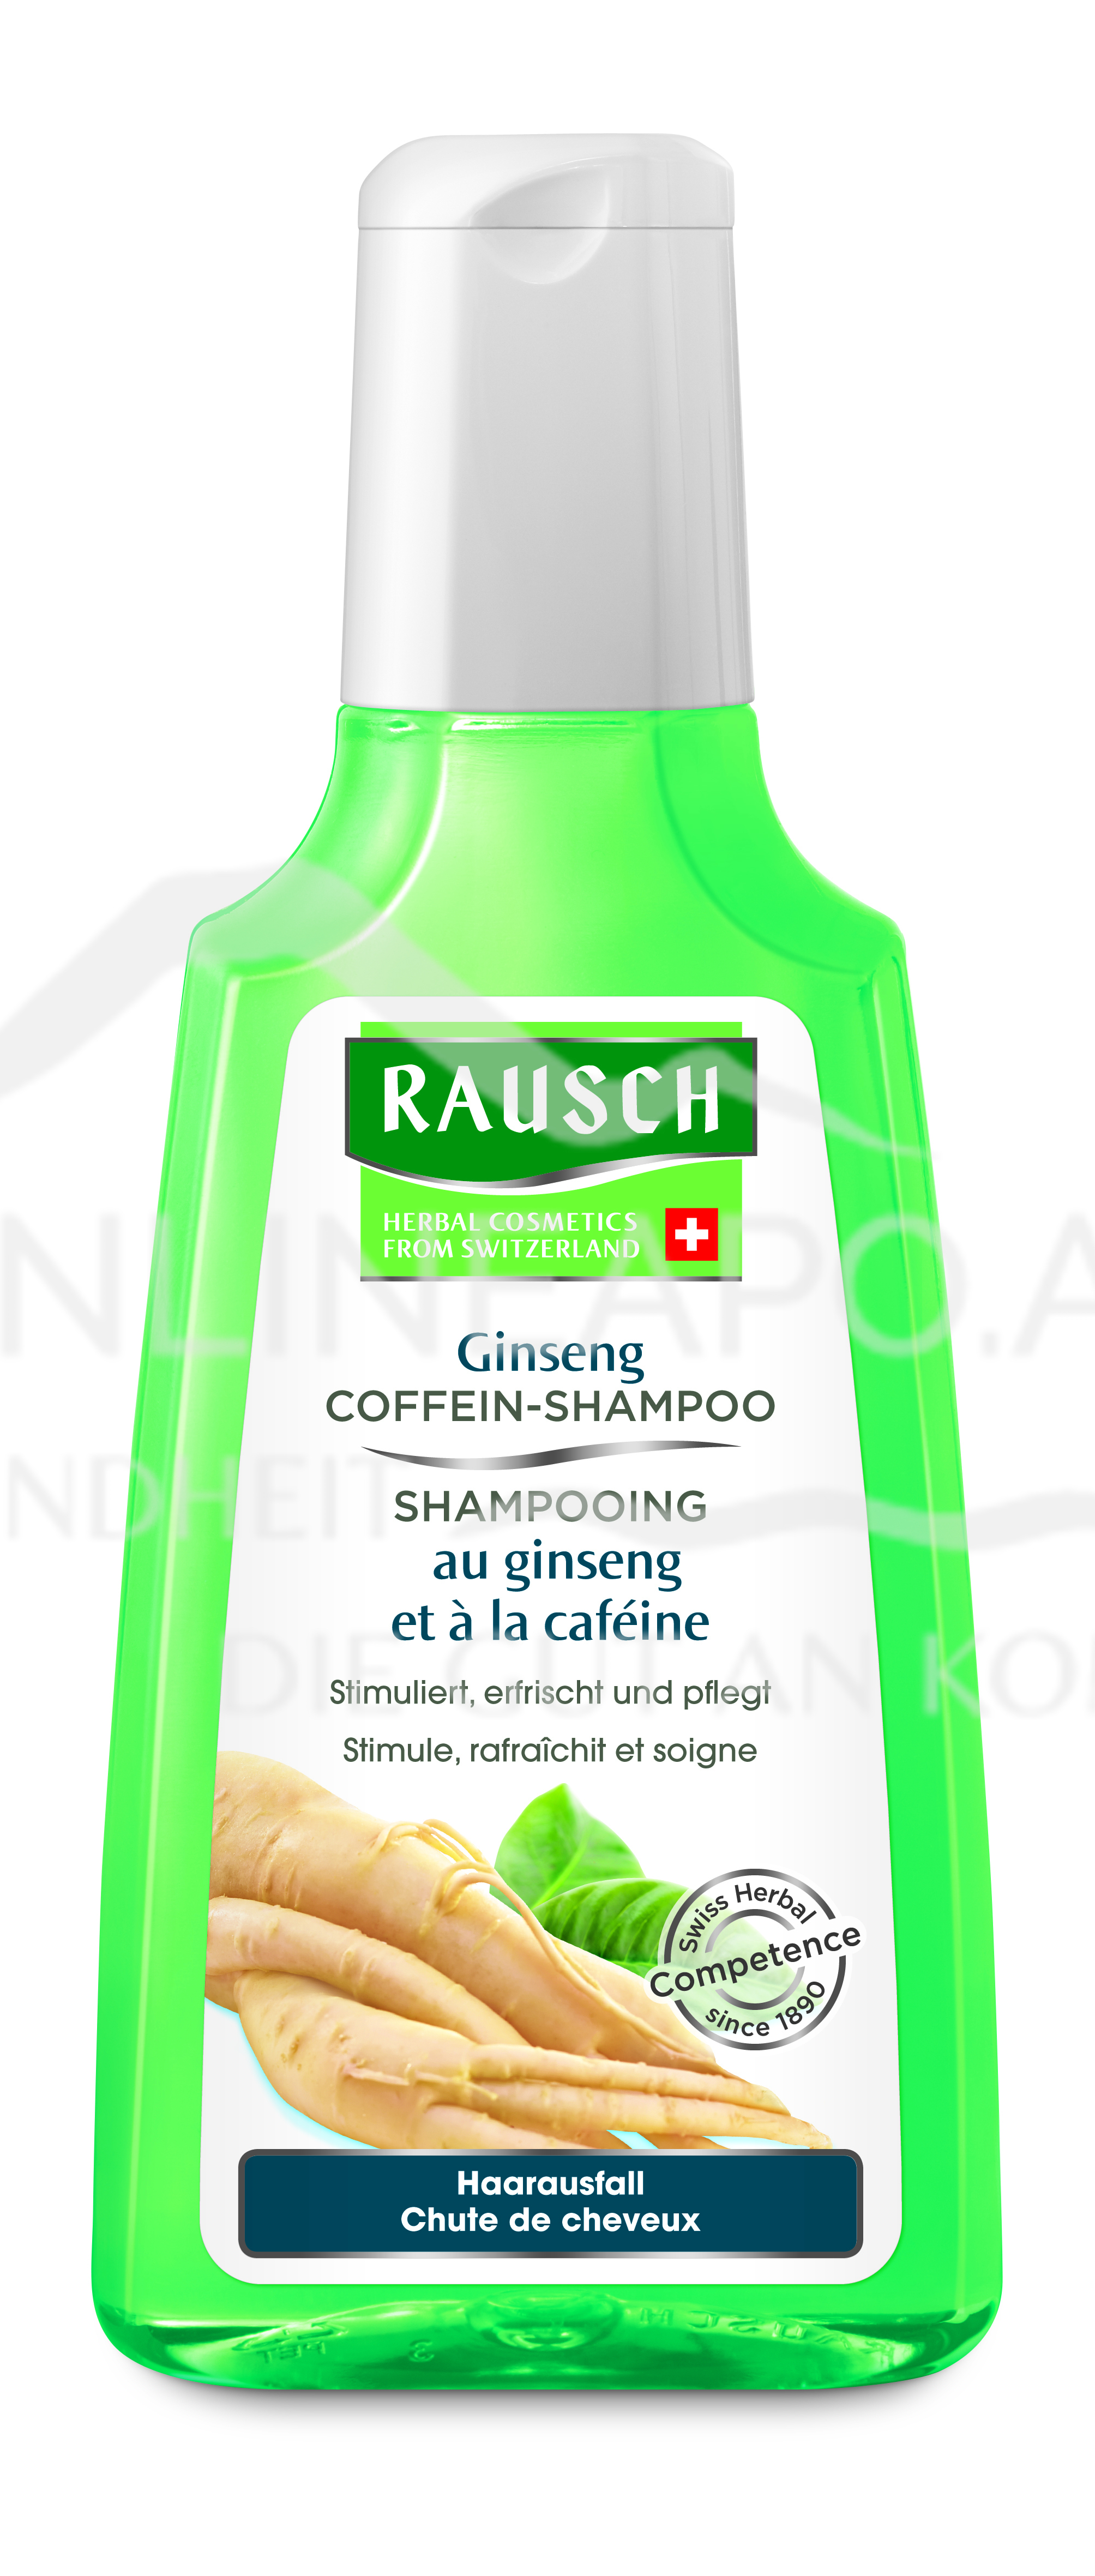 Rausch Ginseng Coffein-Shampoo